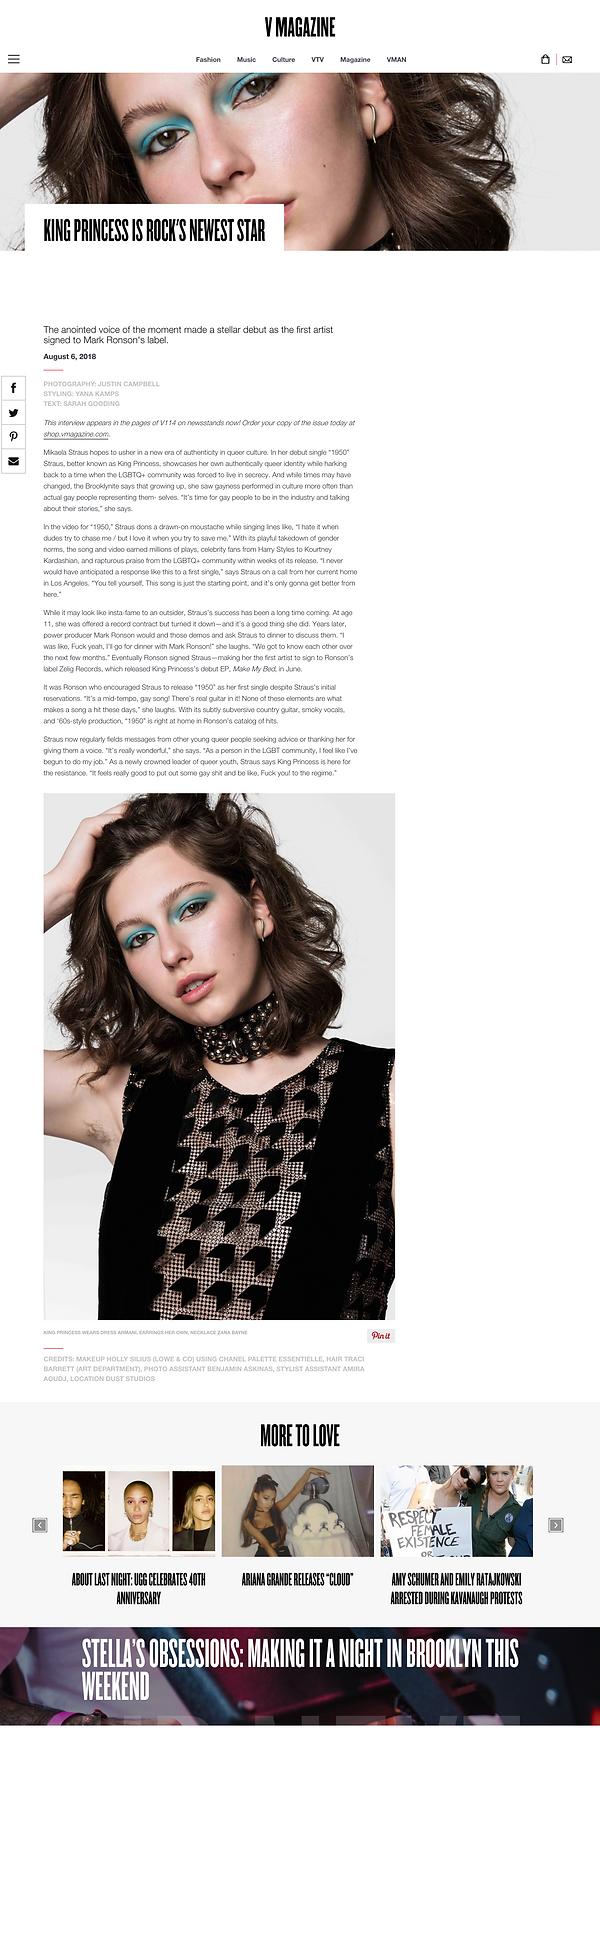 KP screencapture-vmagazine-article-king-